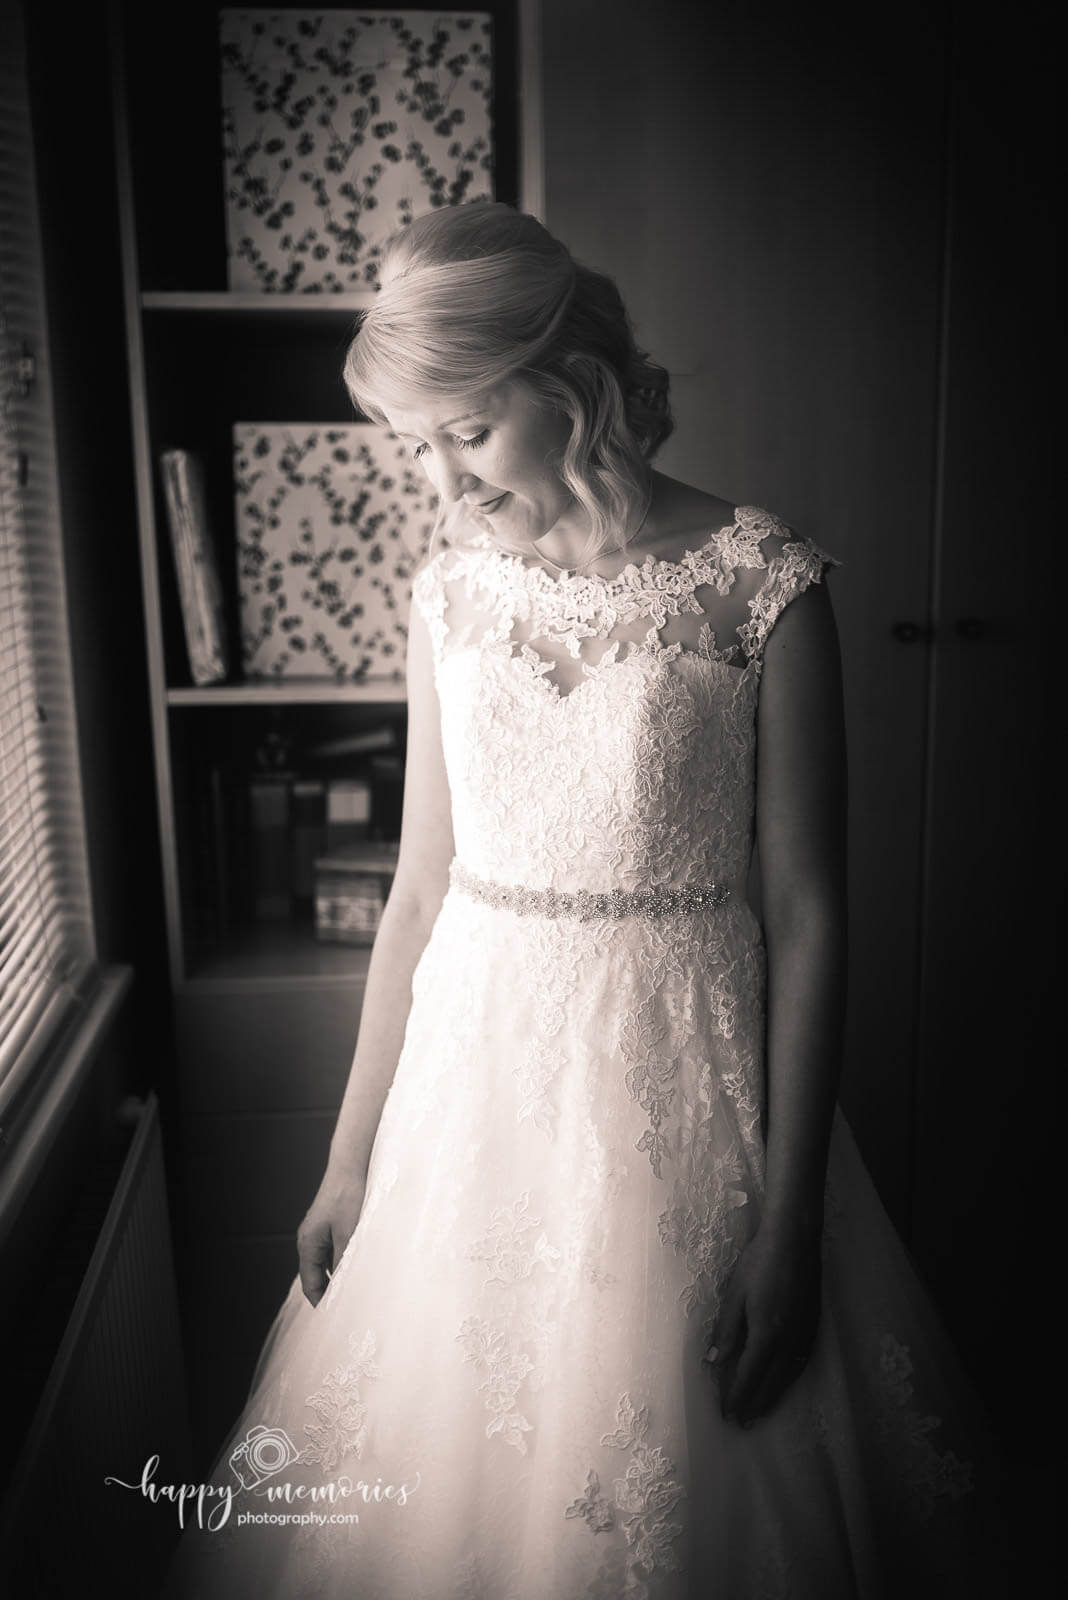 Wedding photographer East Grinstead-23